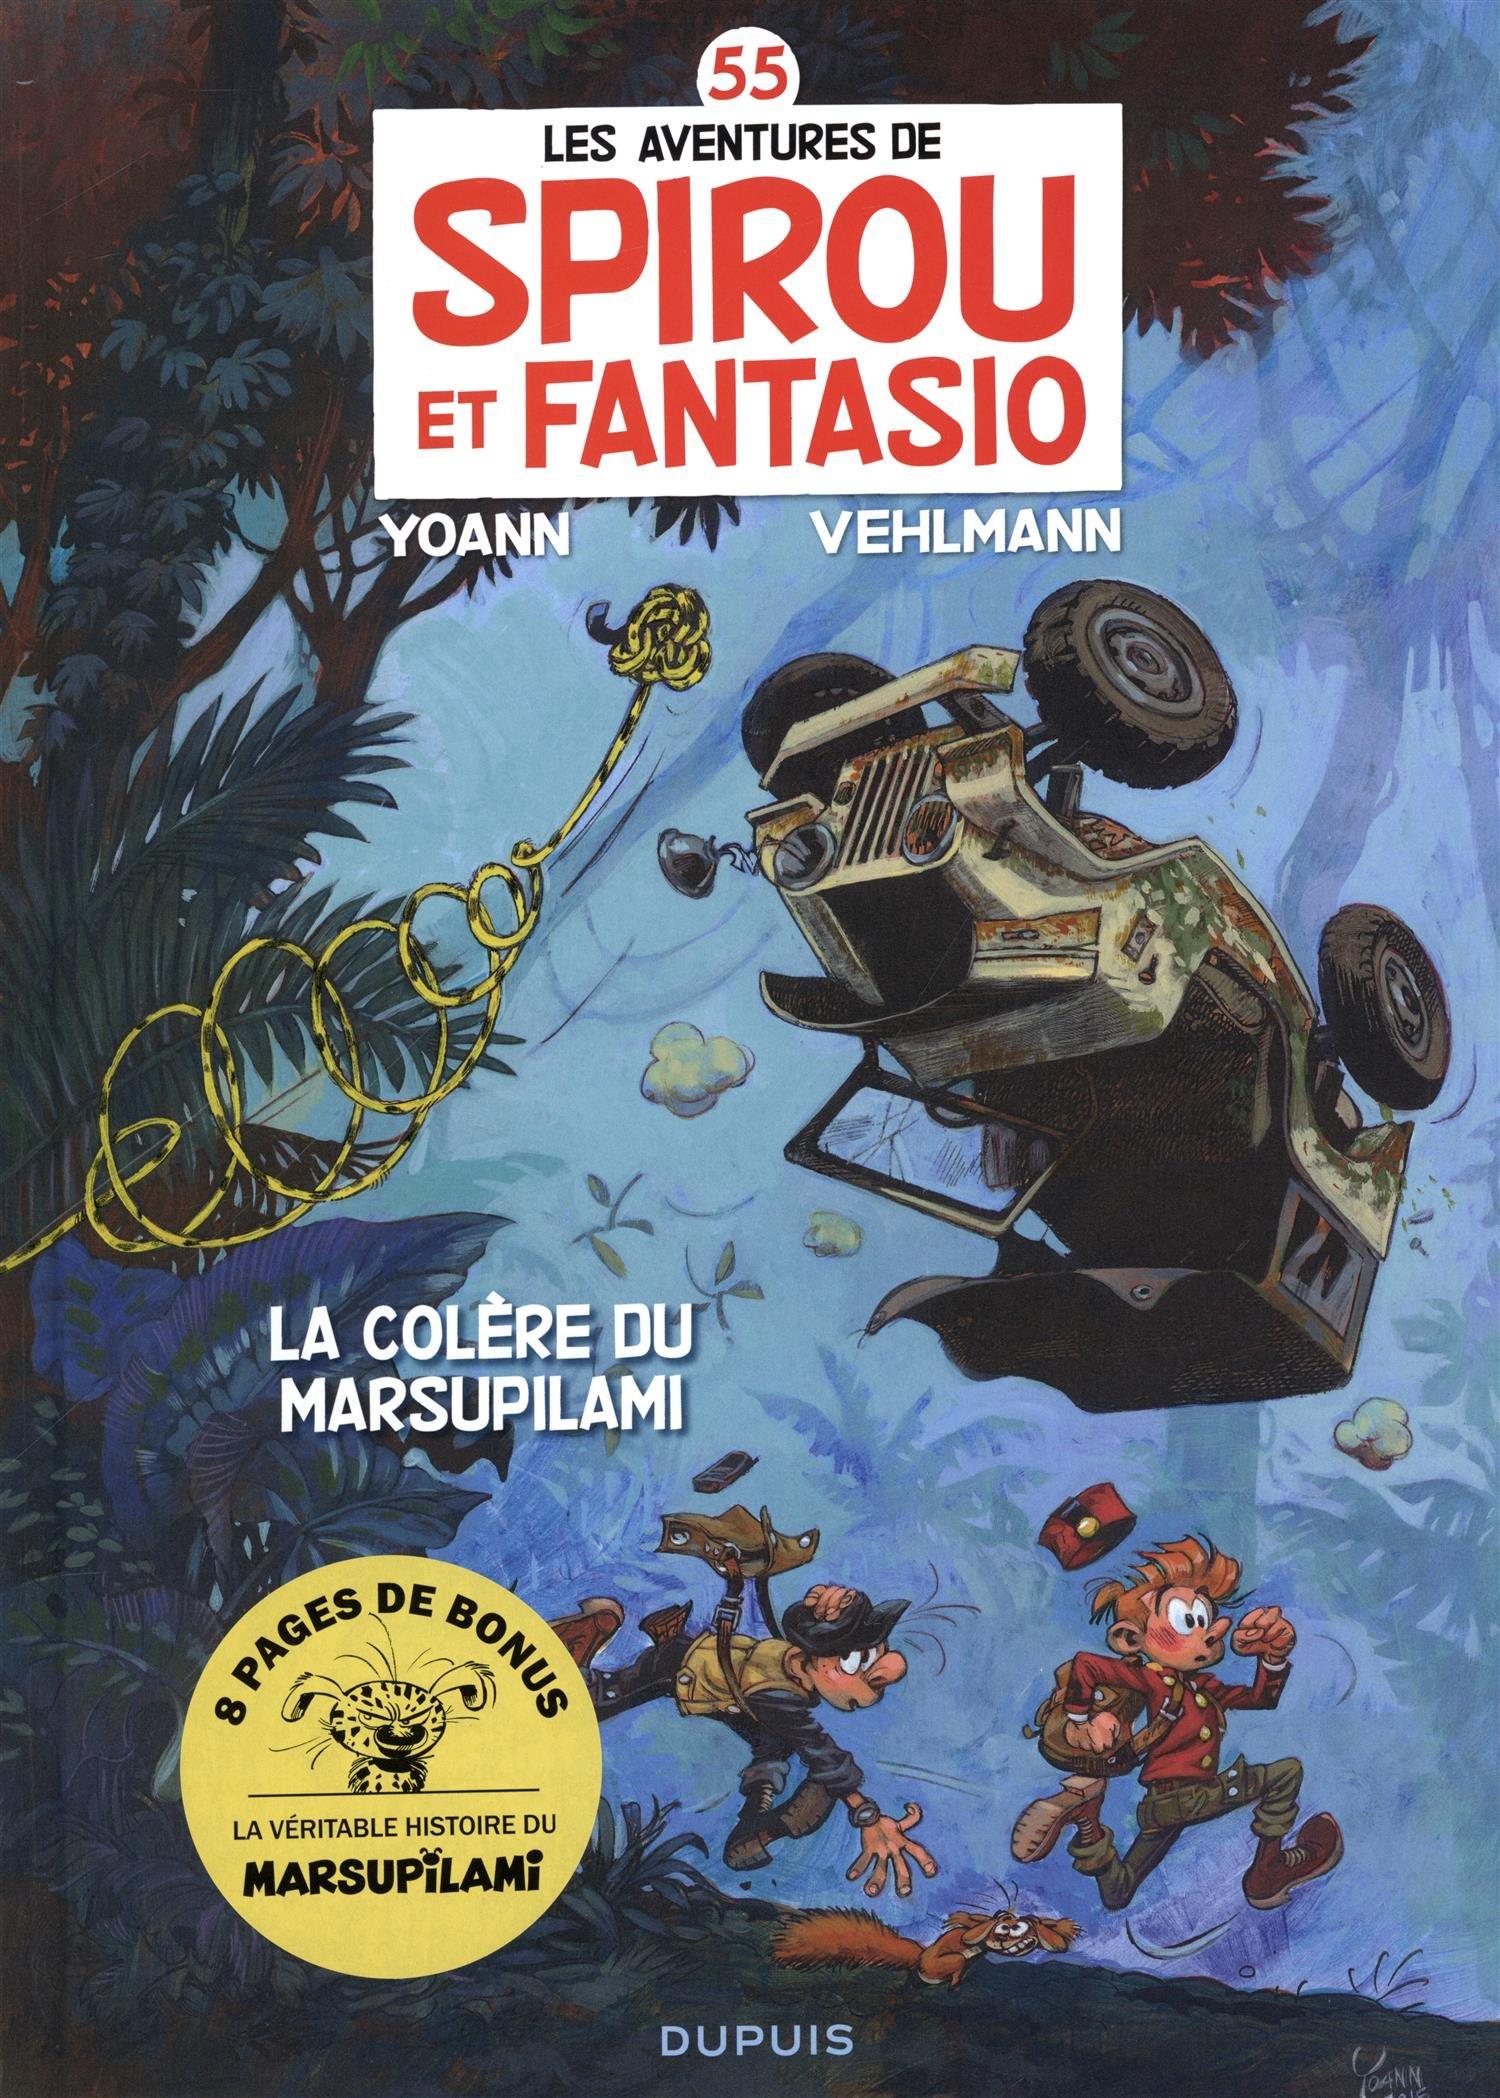 Spirou et Fantasio Tomes 1 à 55